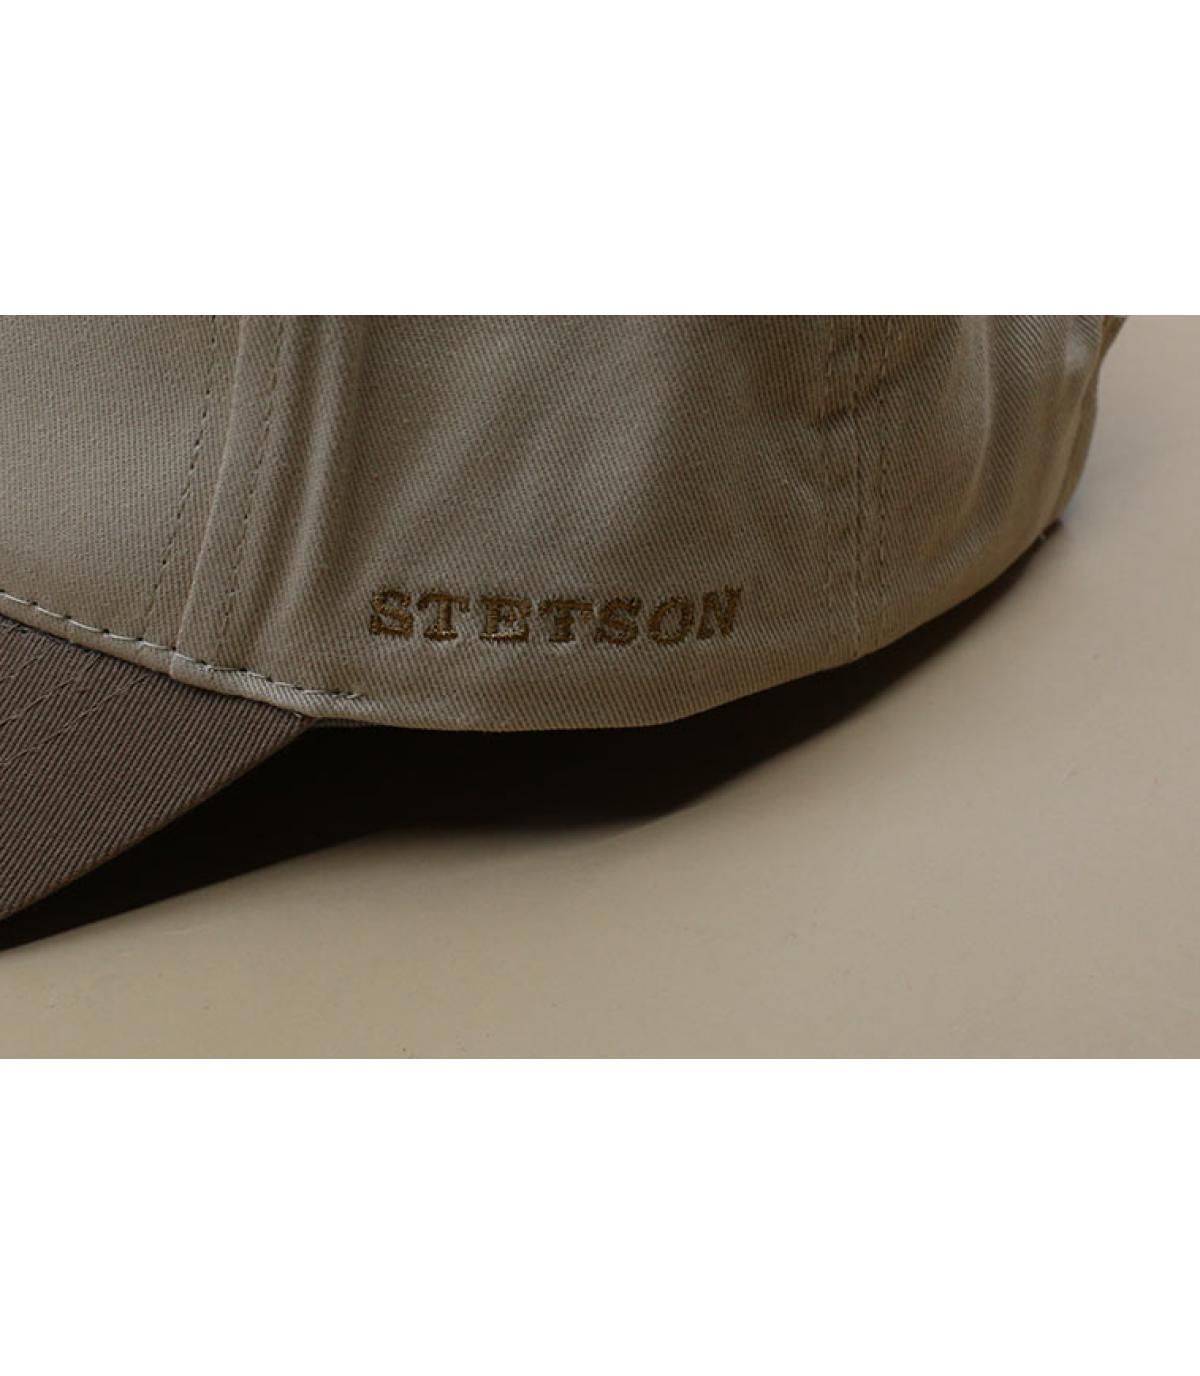 Details Baseball Cap Cotton brown beige - afbeeling 3